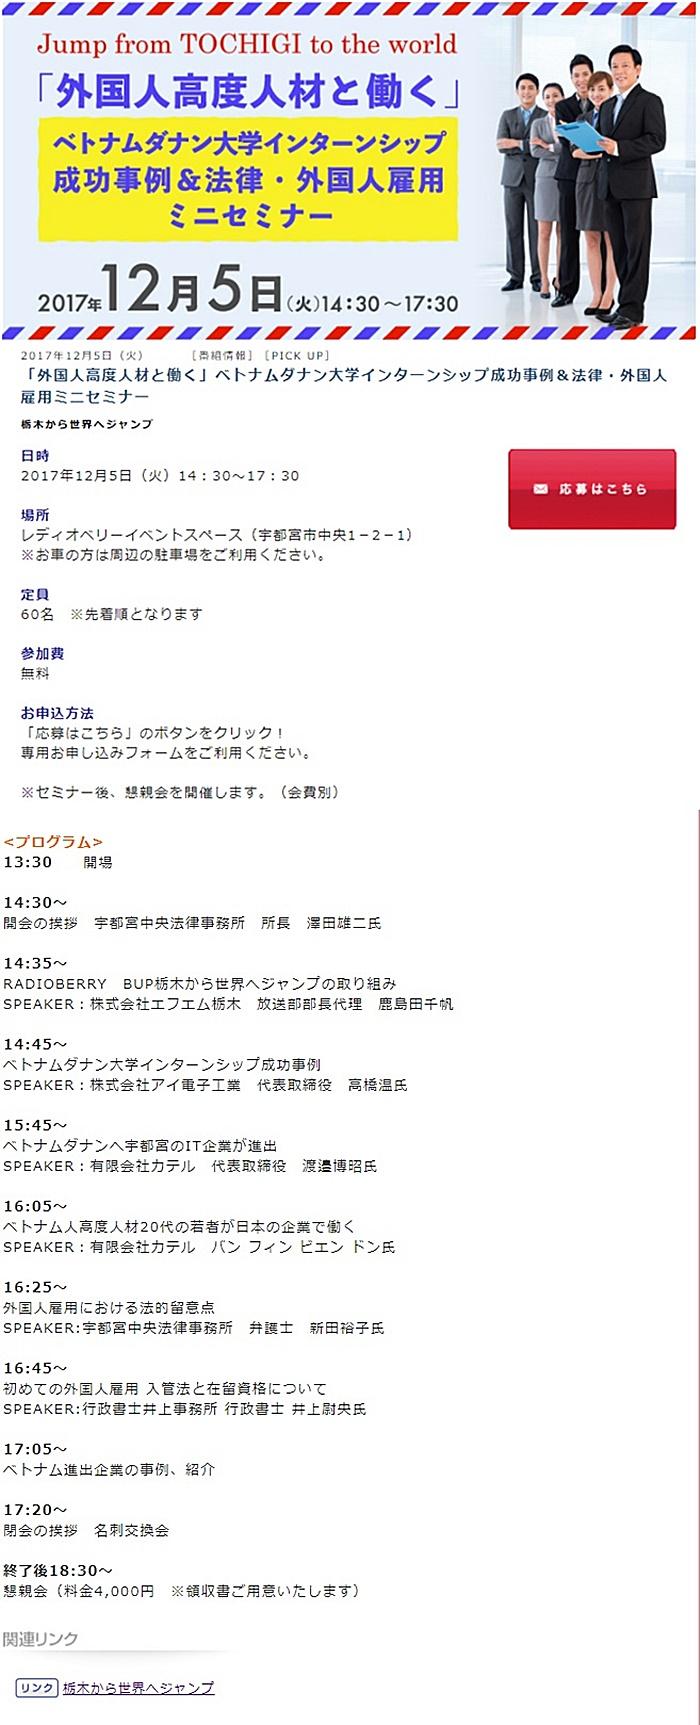 レディオベリー 被告澤田雄二弁護士 被告新田裕子弁護士